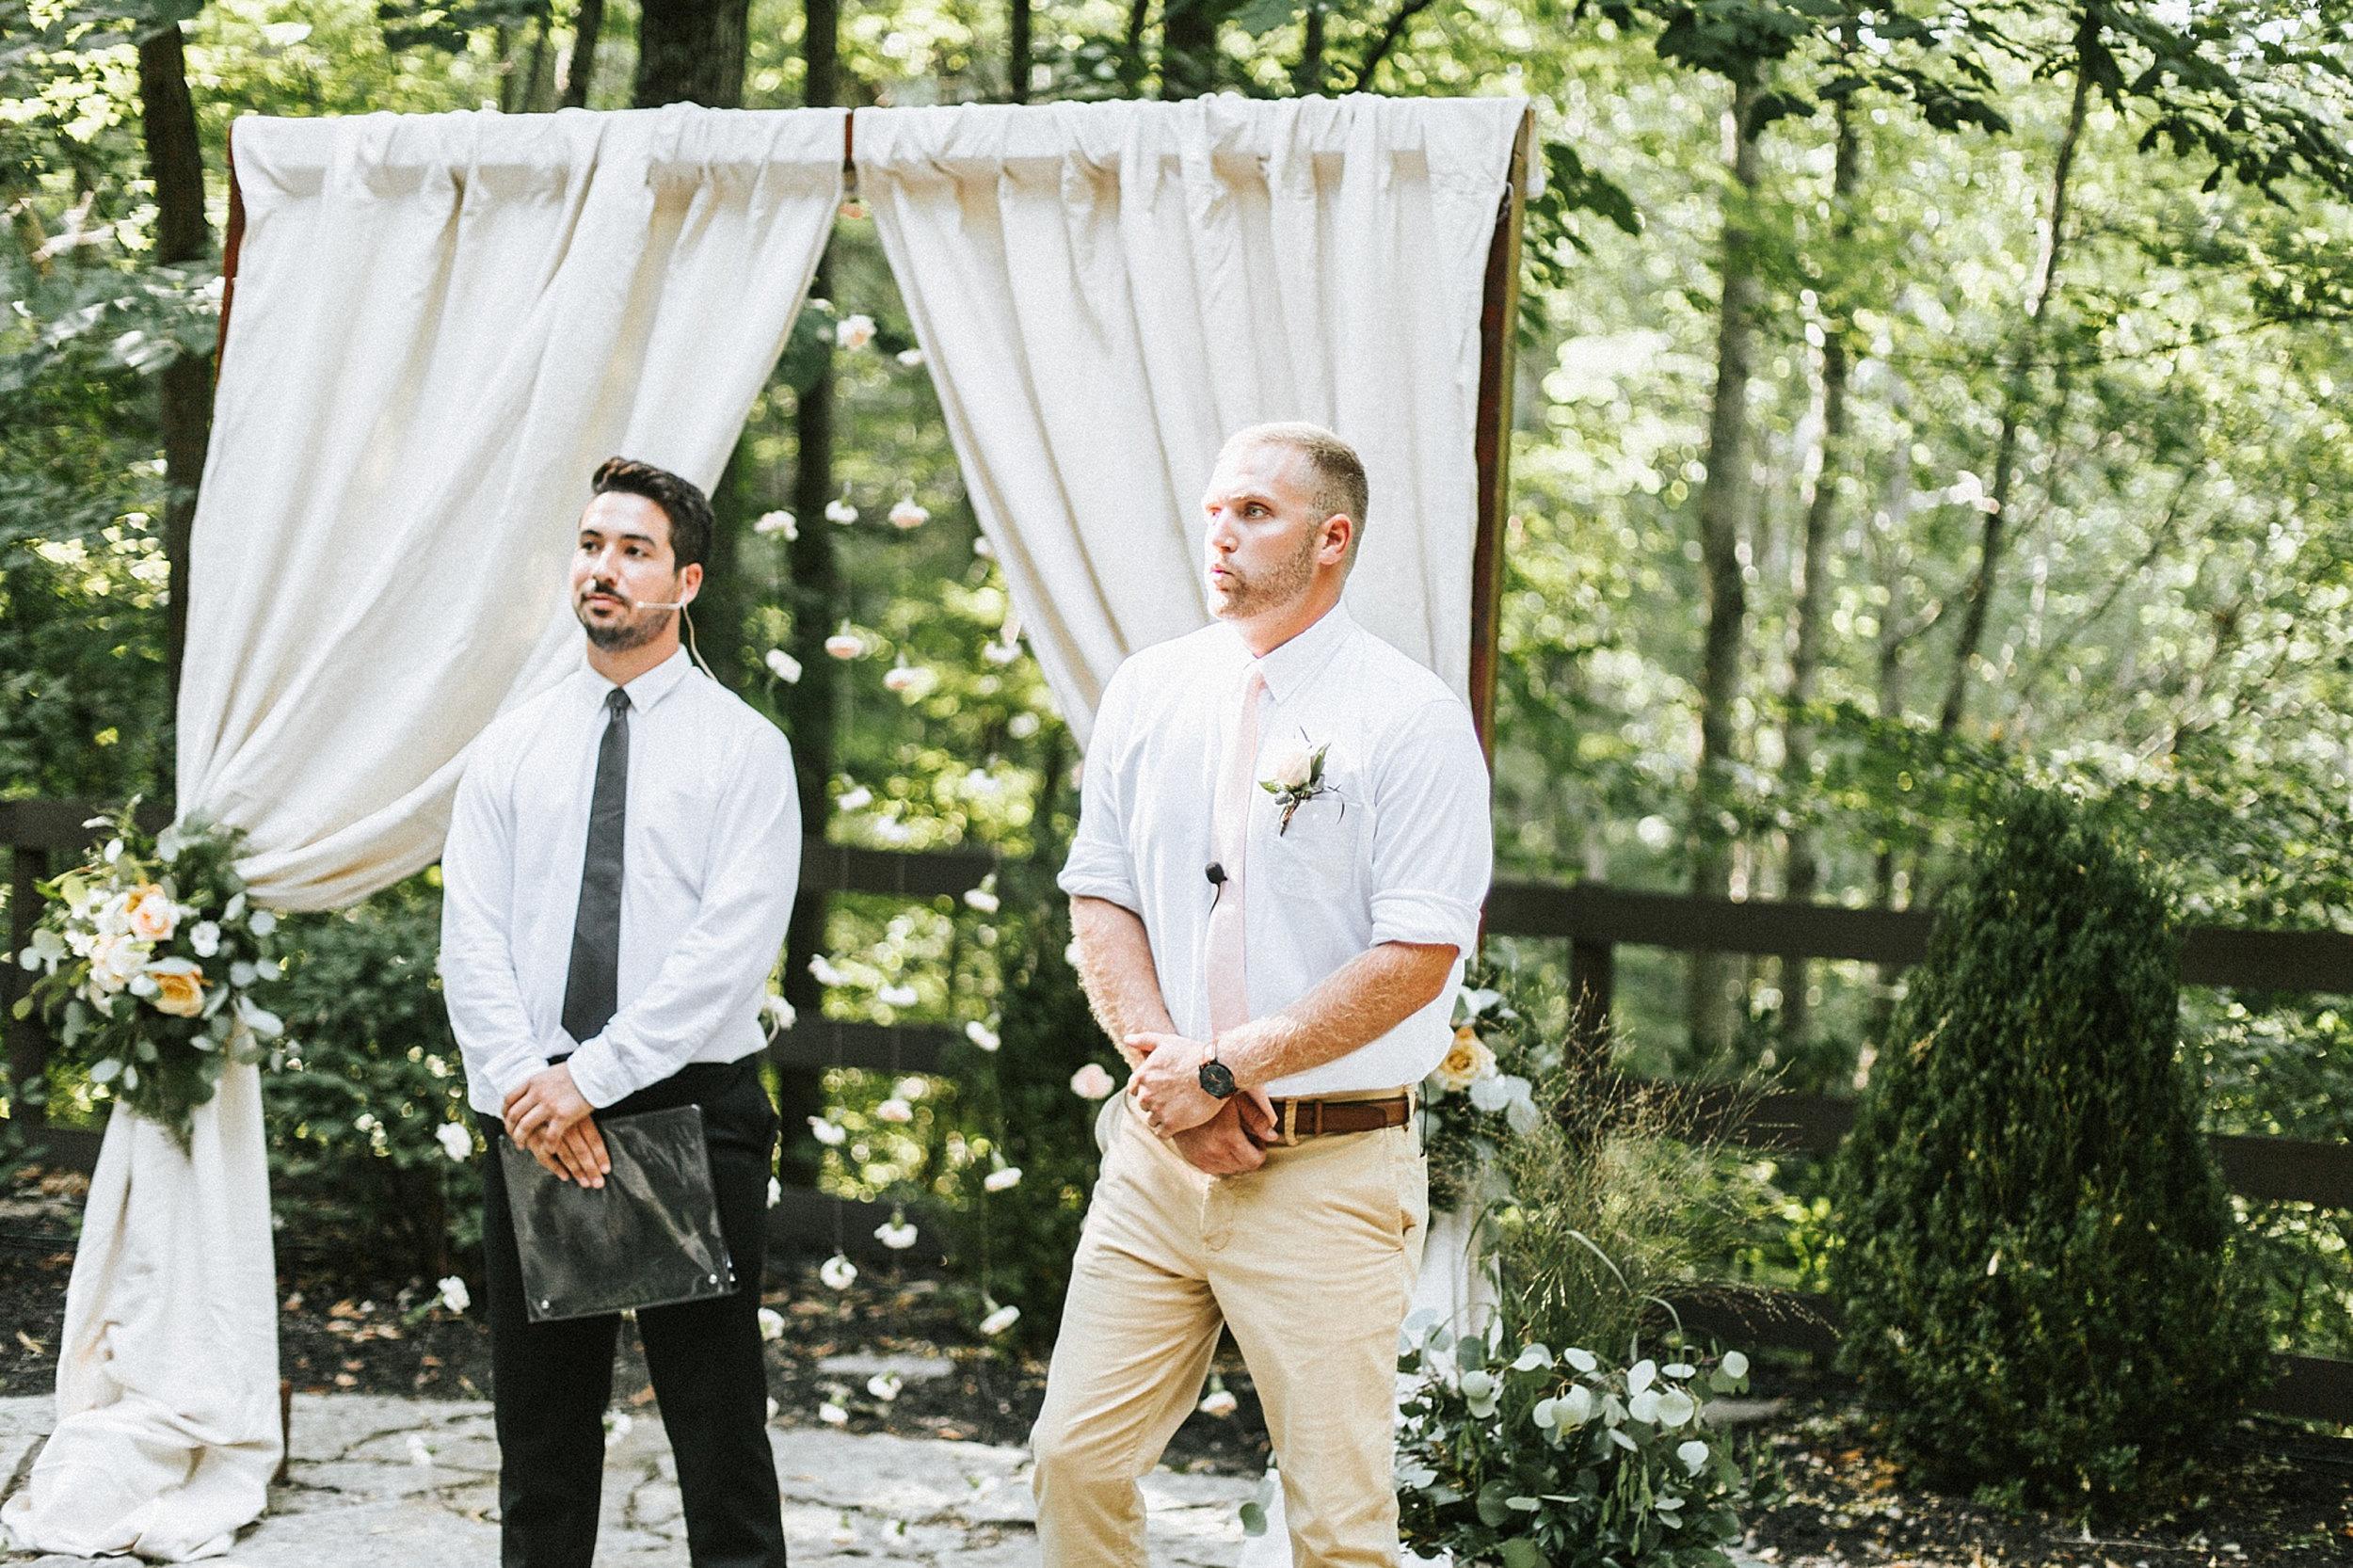 Brooke Townsend Photography - Cincinnati Wedding Photographer (58 of 153).jpg